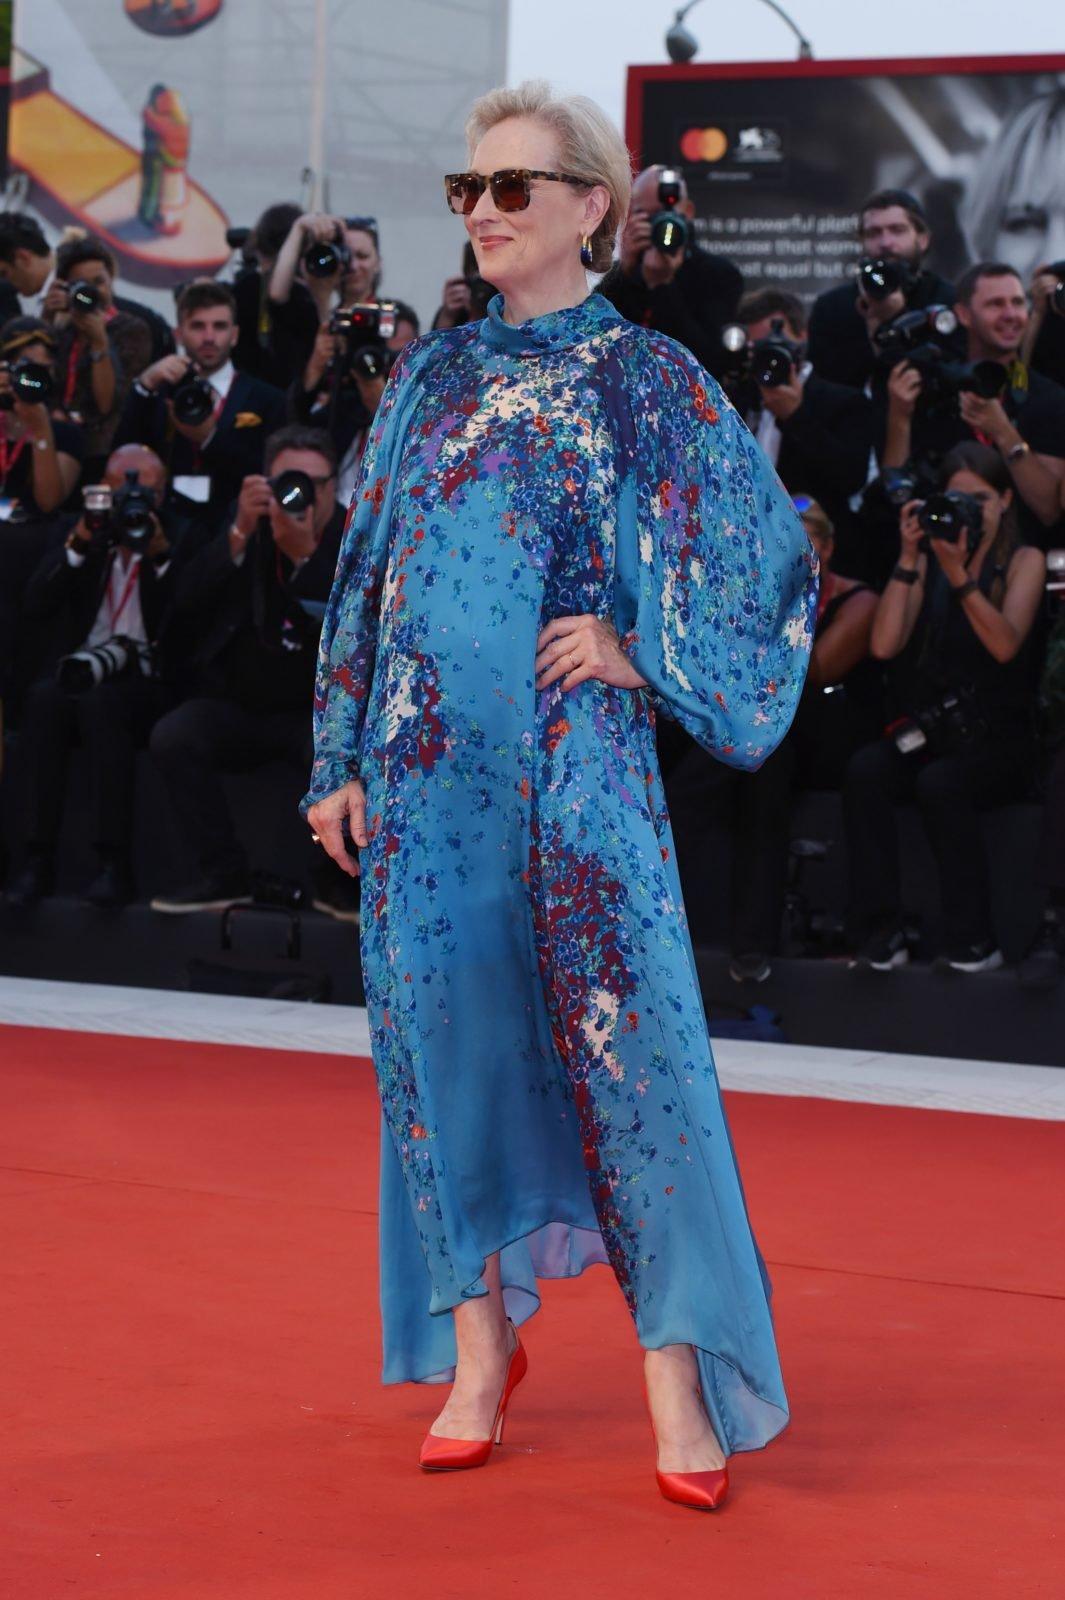 Meryl Streep showed off some dramatic gypsy sleeves. Source: Getty.